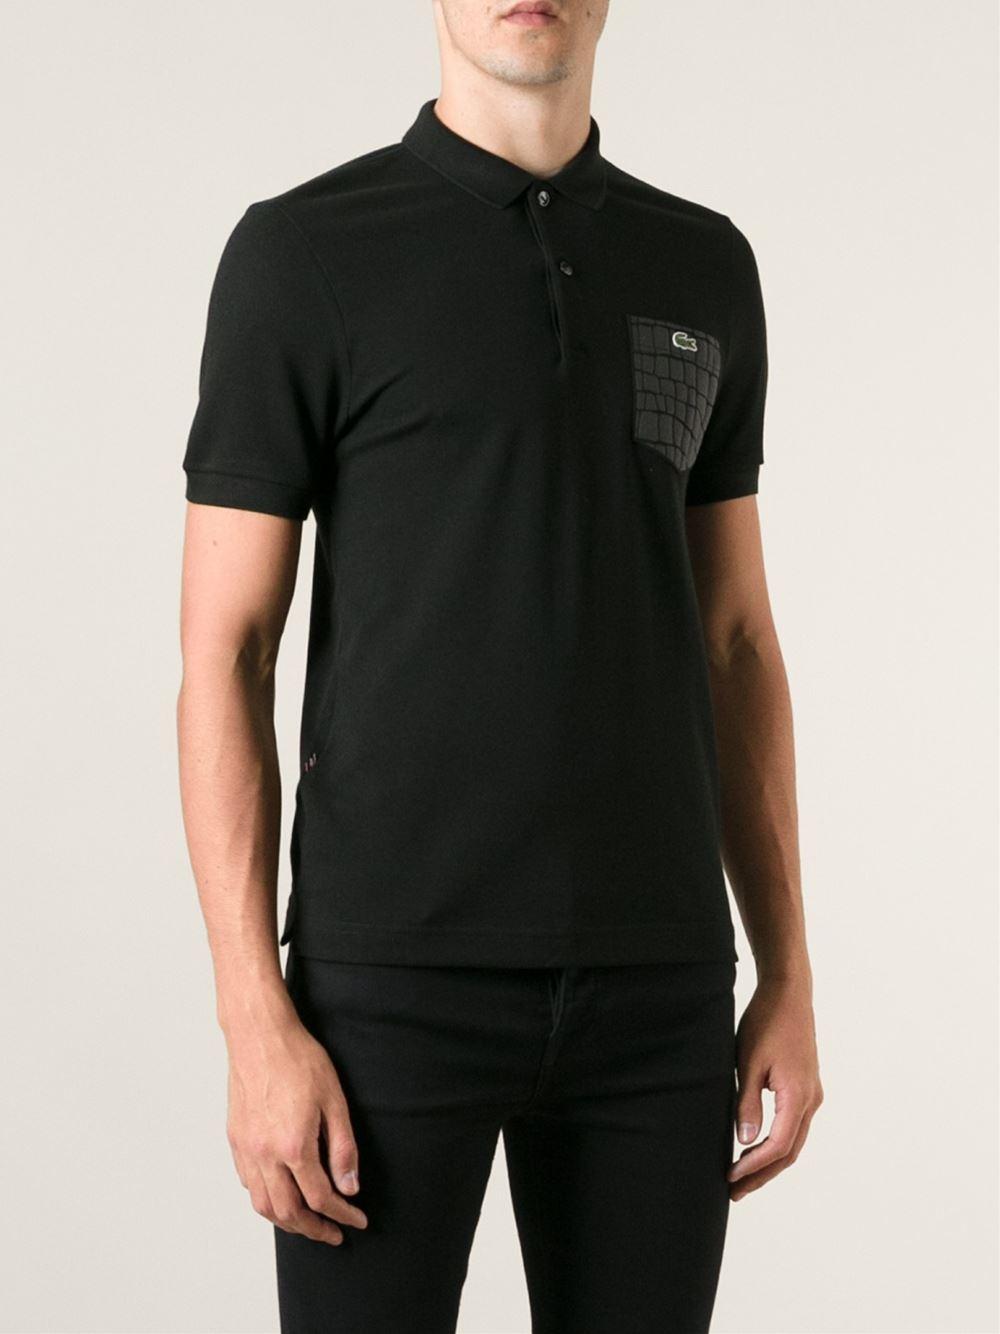 953d3f5d6d31a Black Polo Shirt Lacoste - BCD Tofu House